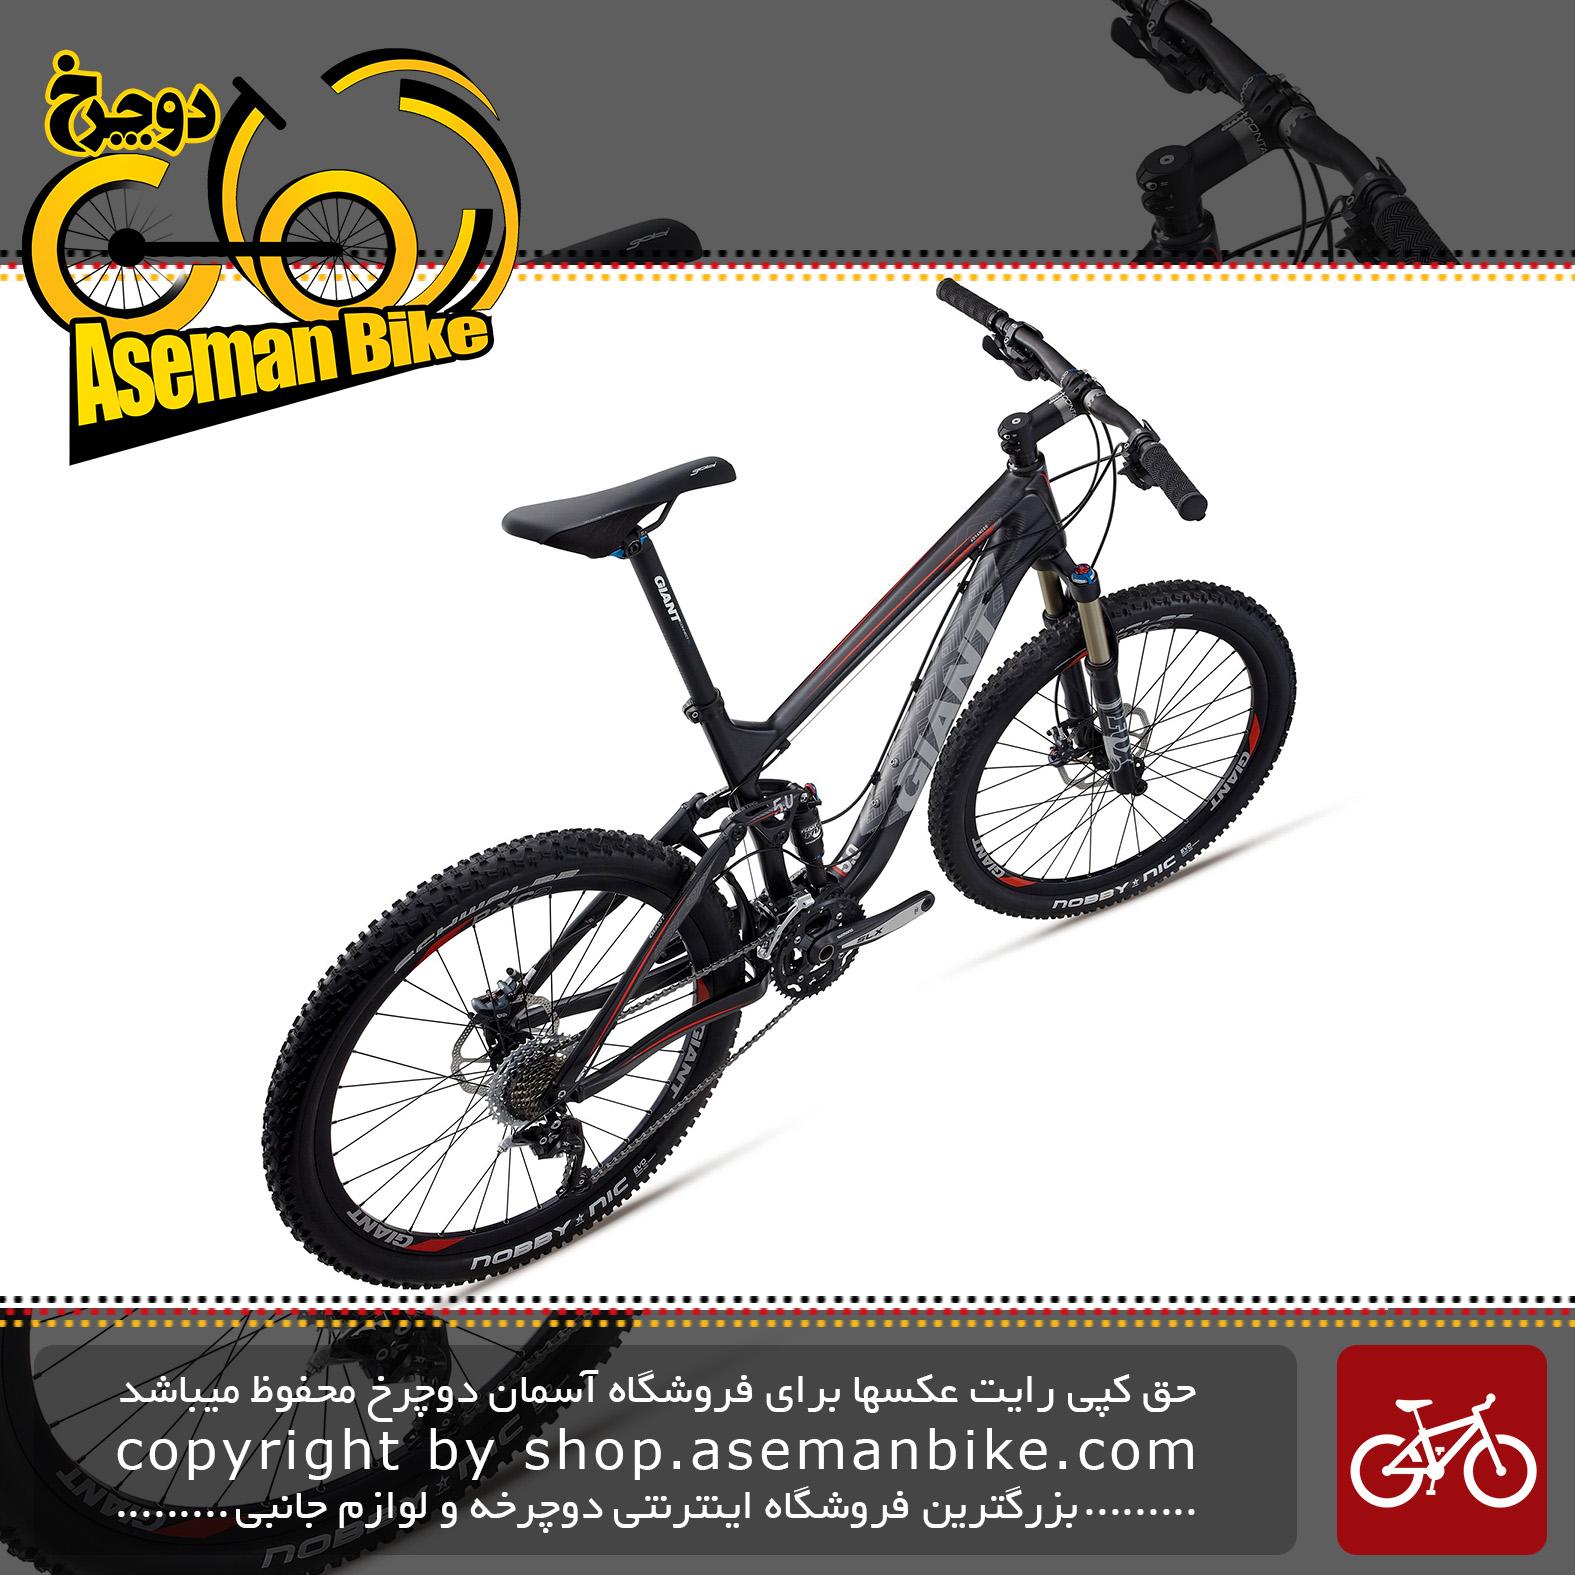 دوچرخه تریل جاینت مدل ترنس ایکس ادونس ۲ سایز ۲۶ Giant Trance X Adavnced 2 2012